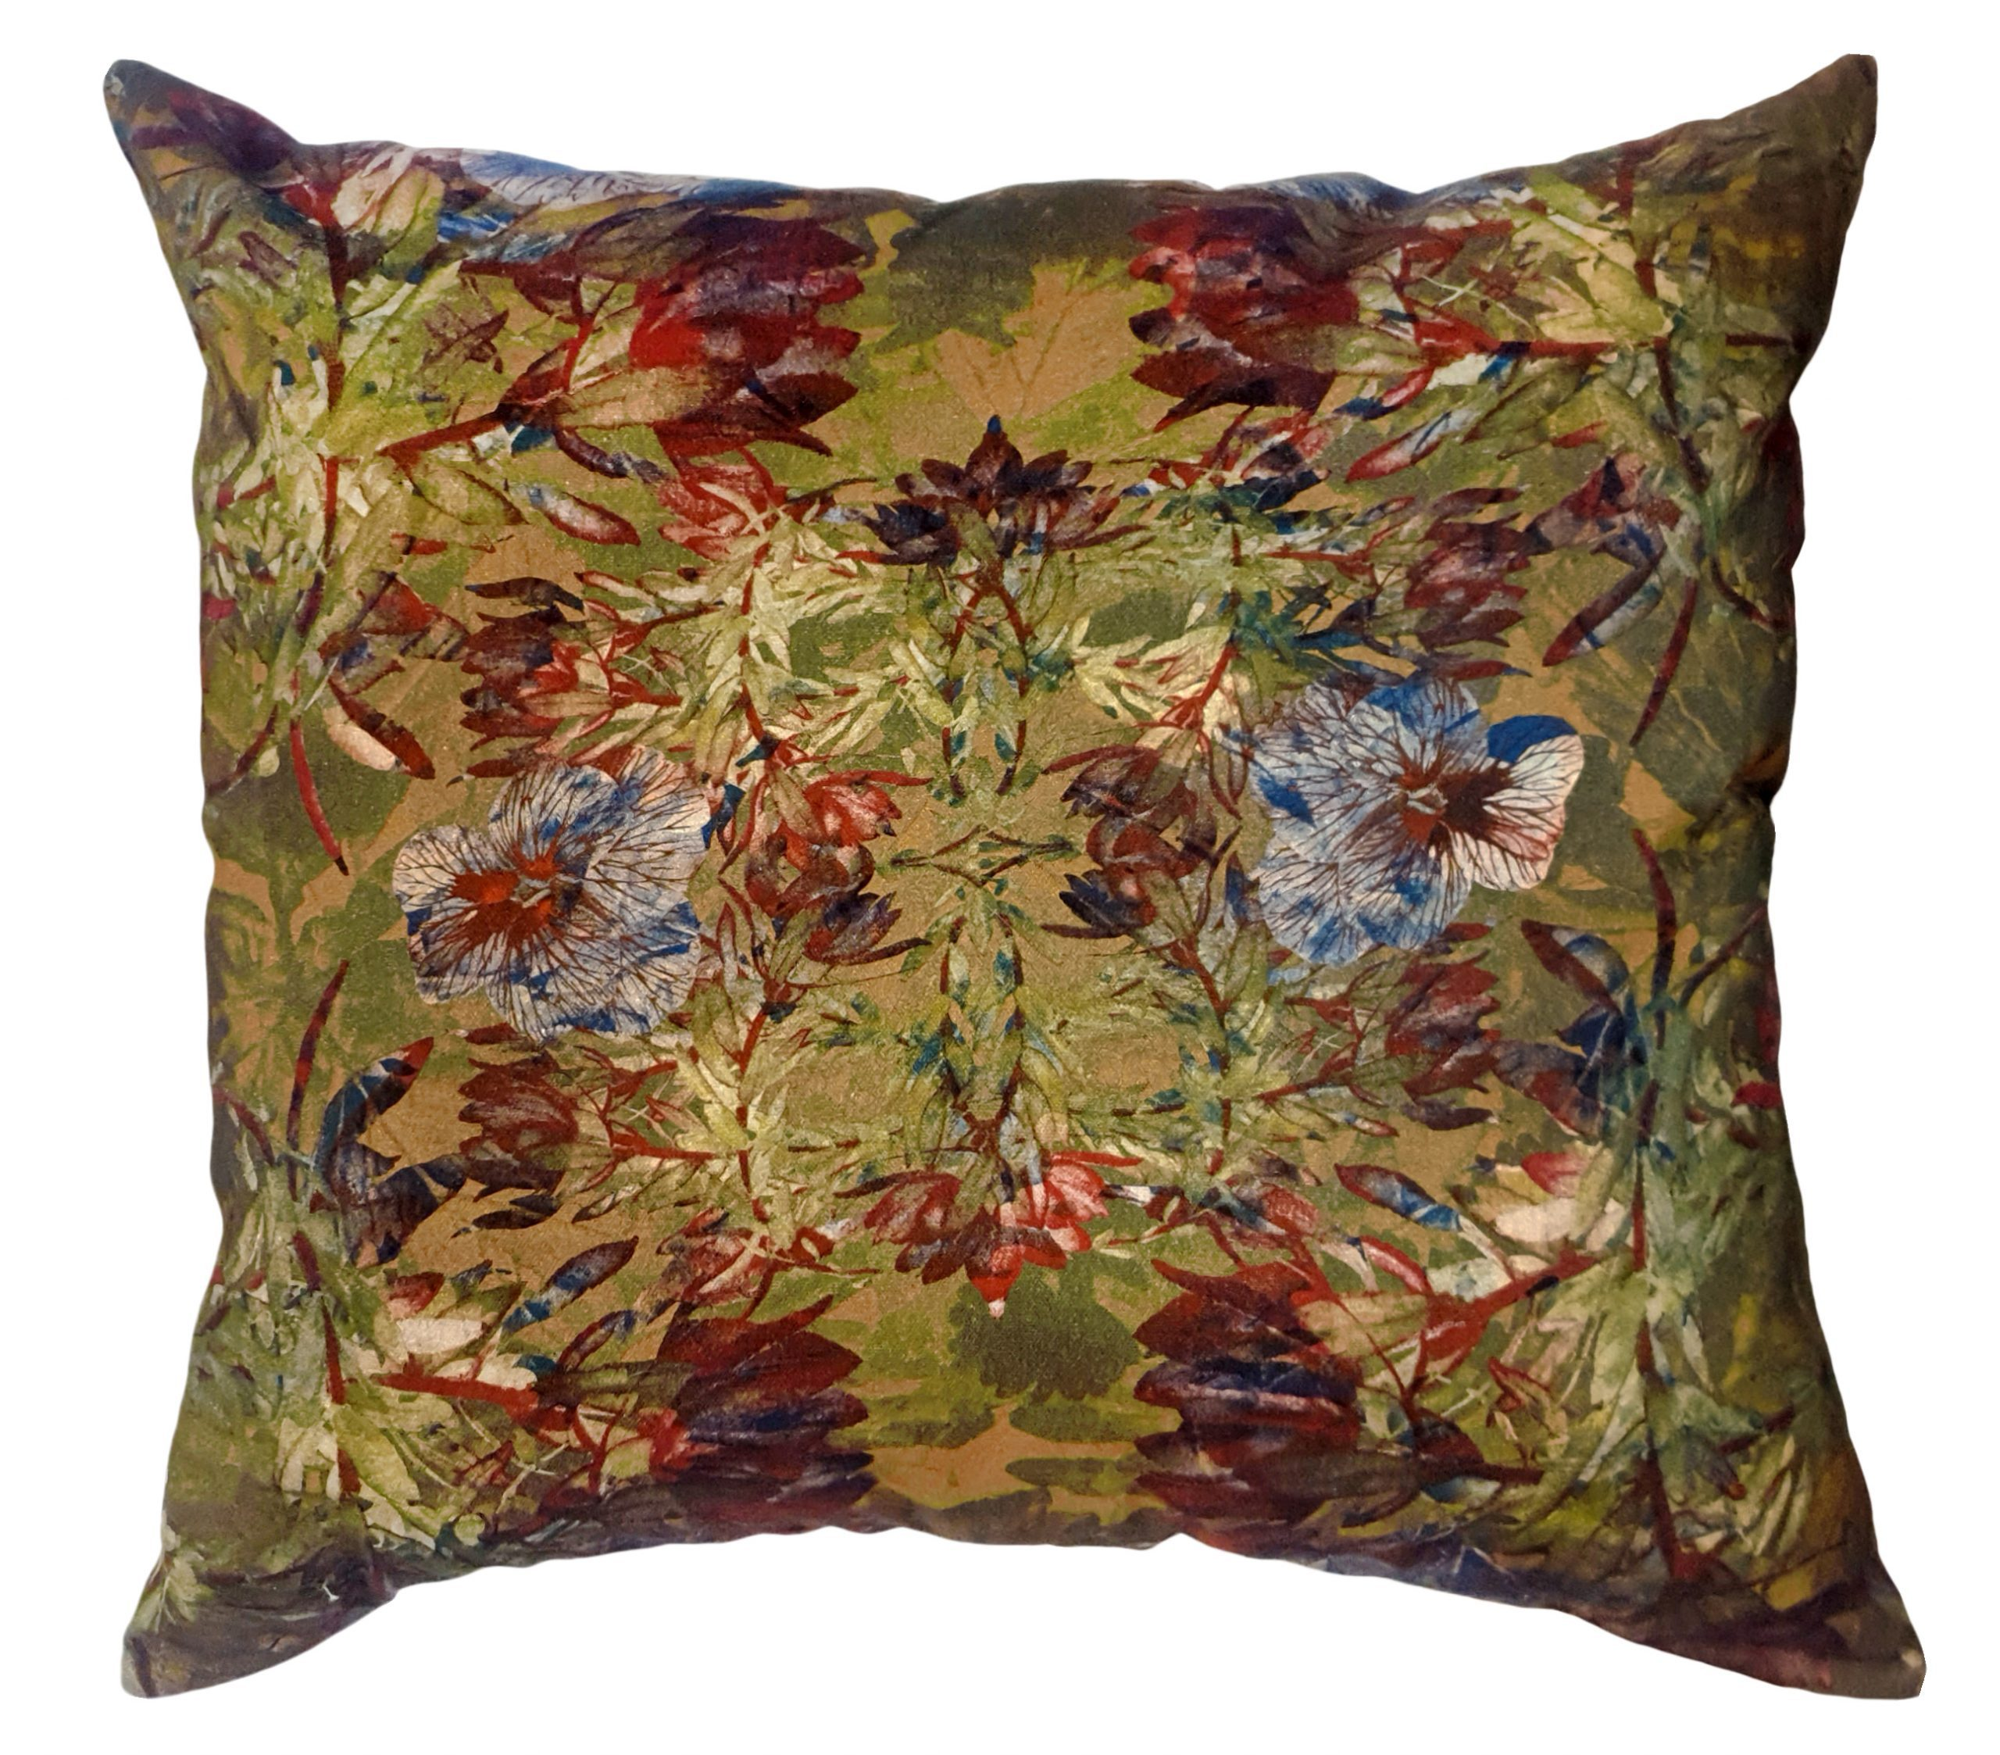 Karoo Scatter Cushion | IV Fashion Design